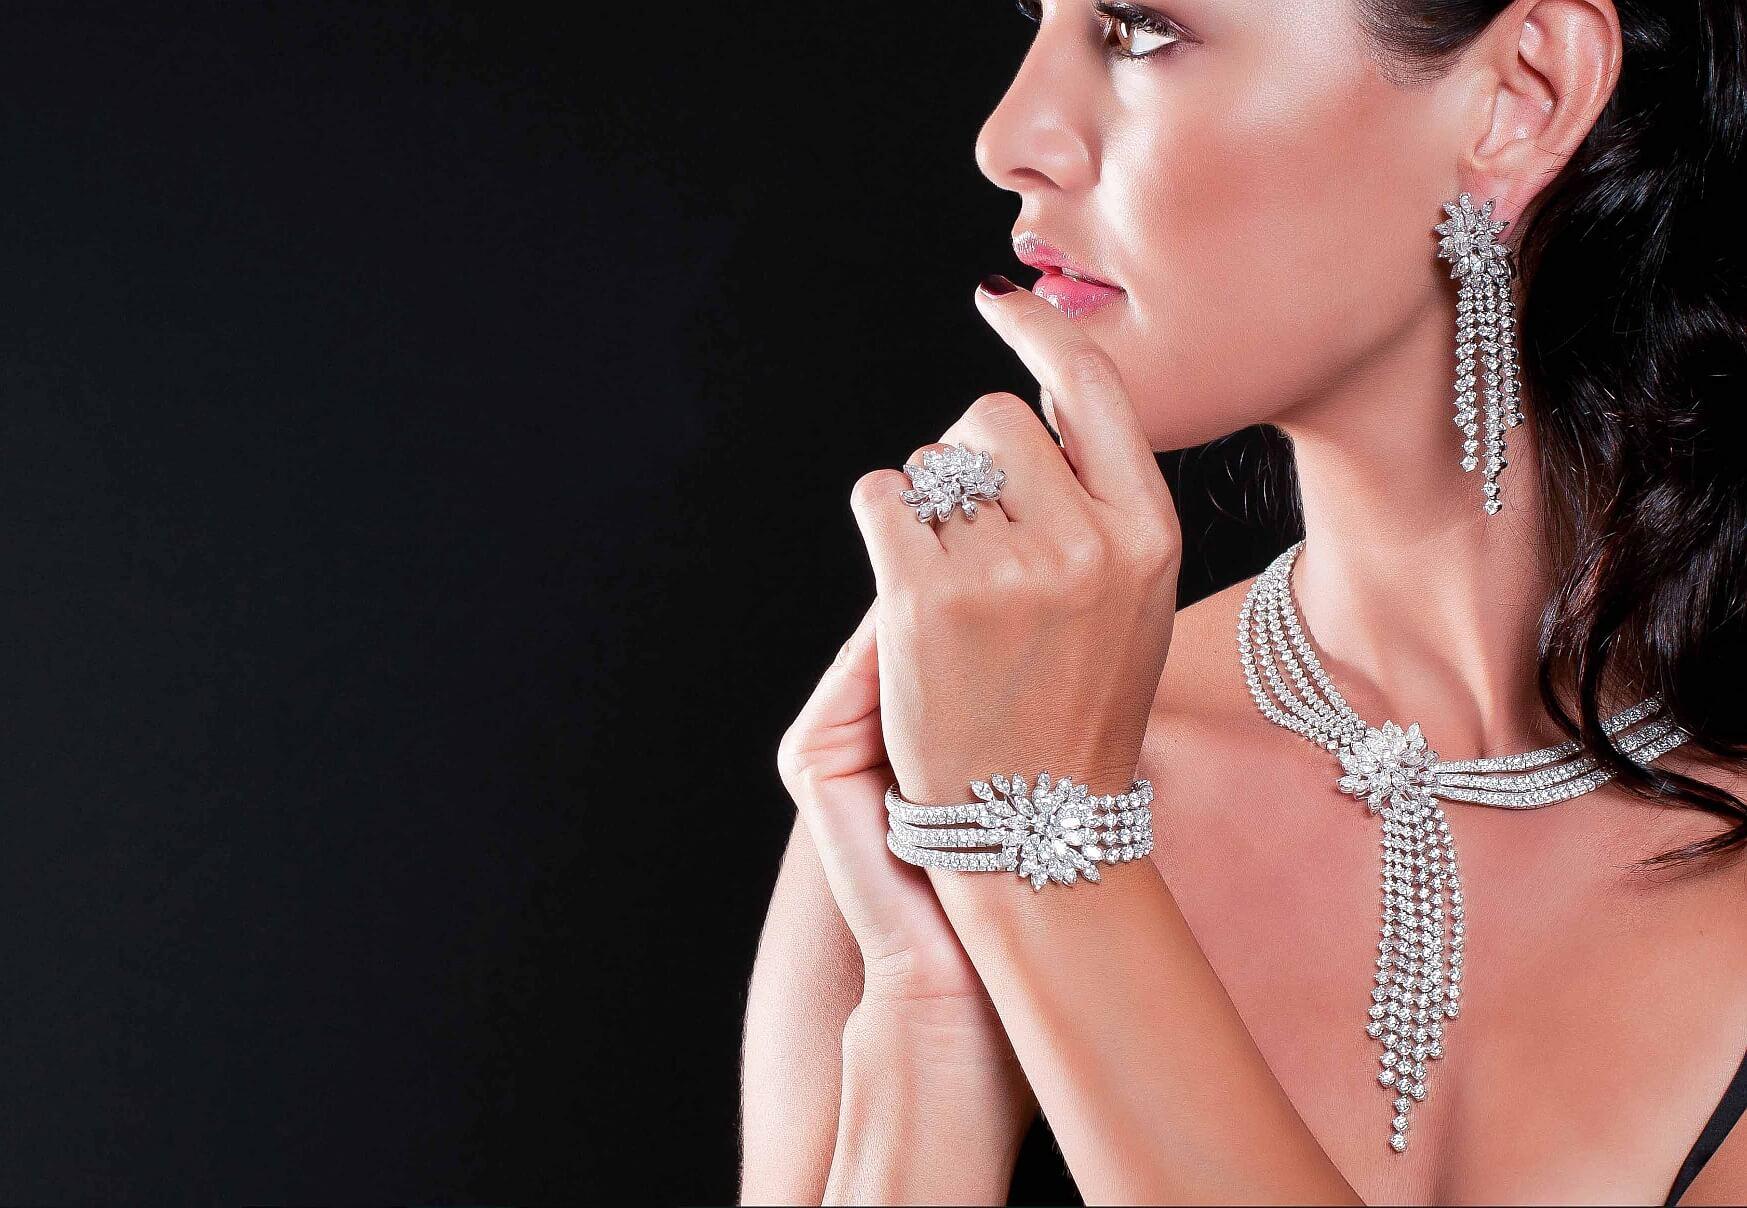 Sissy dominate wife hotwife slut necklace femdom lifestyle jewellery silver cd